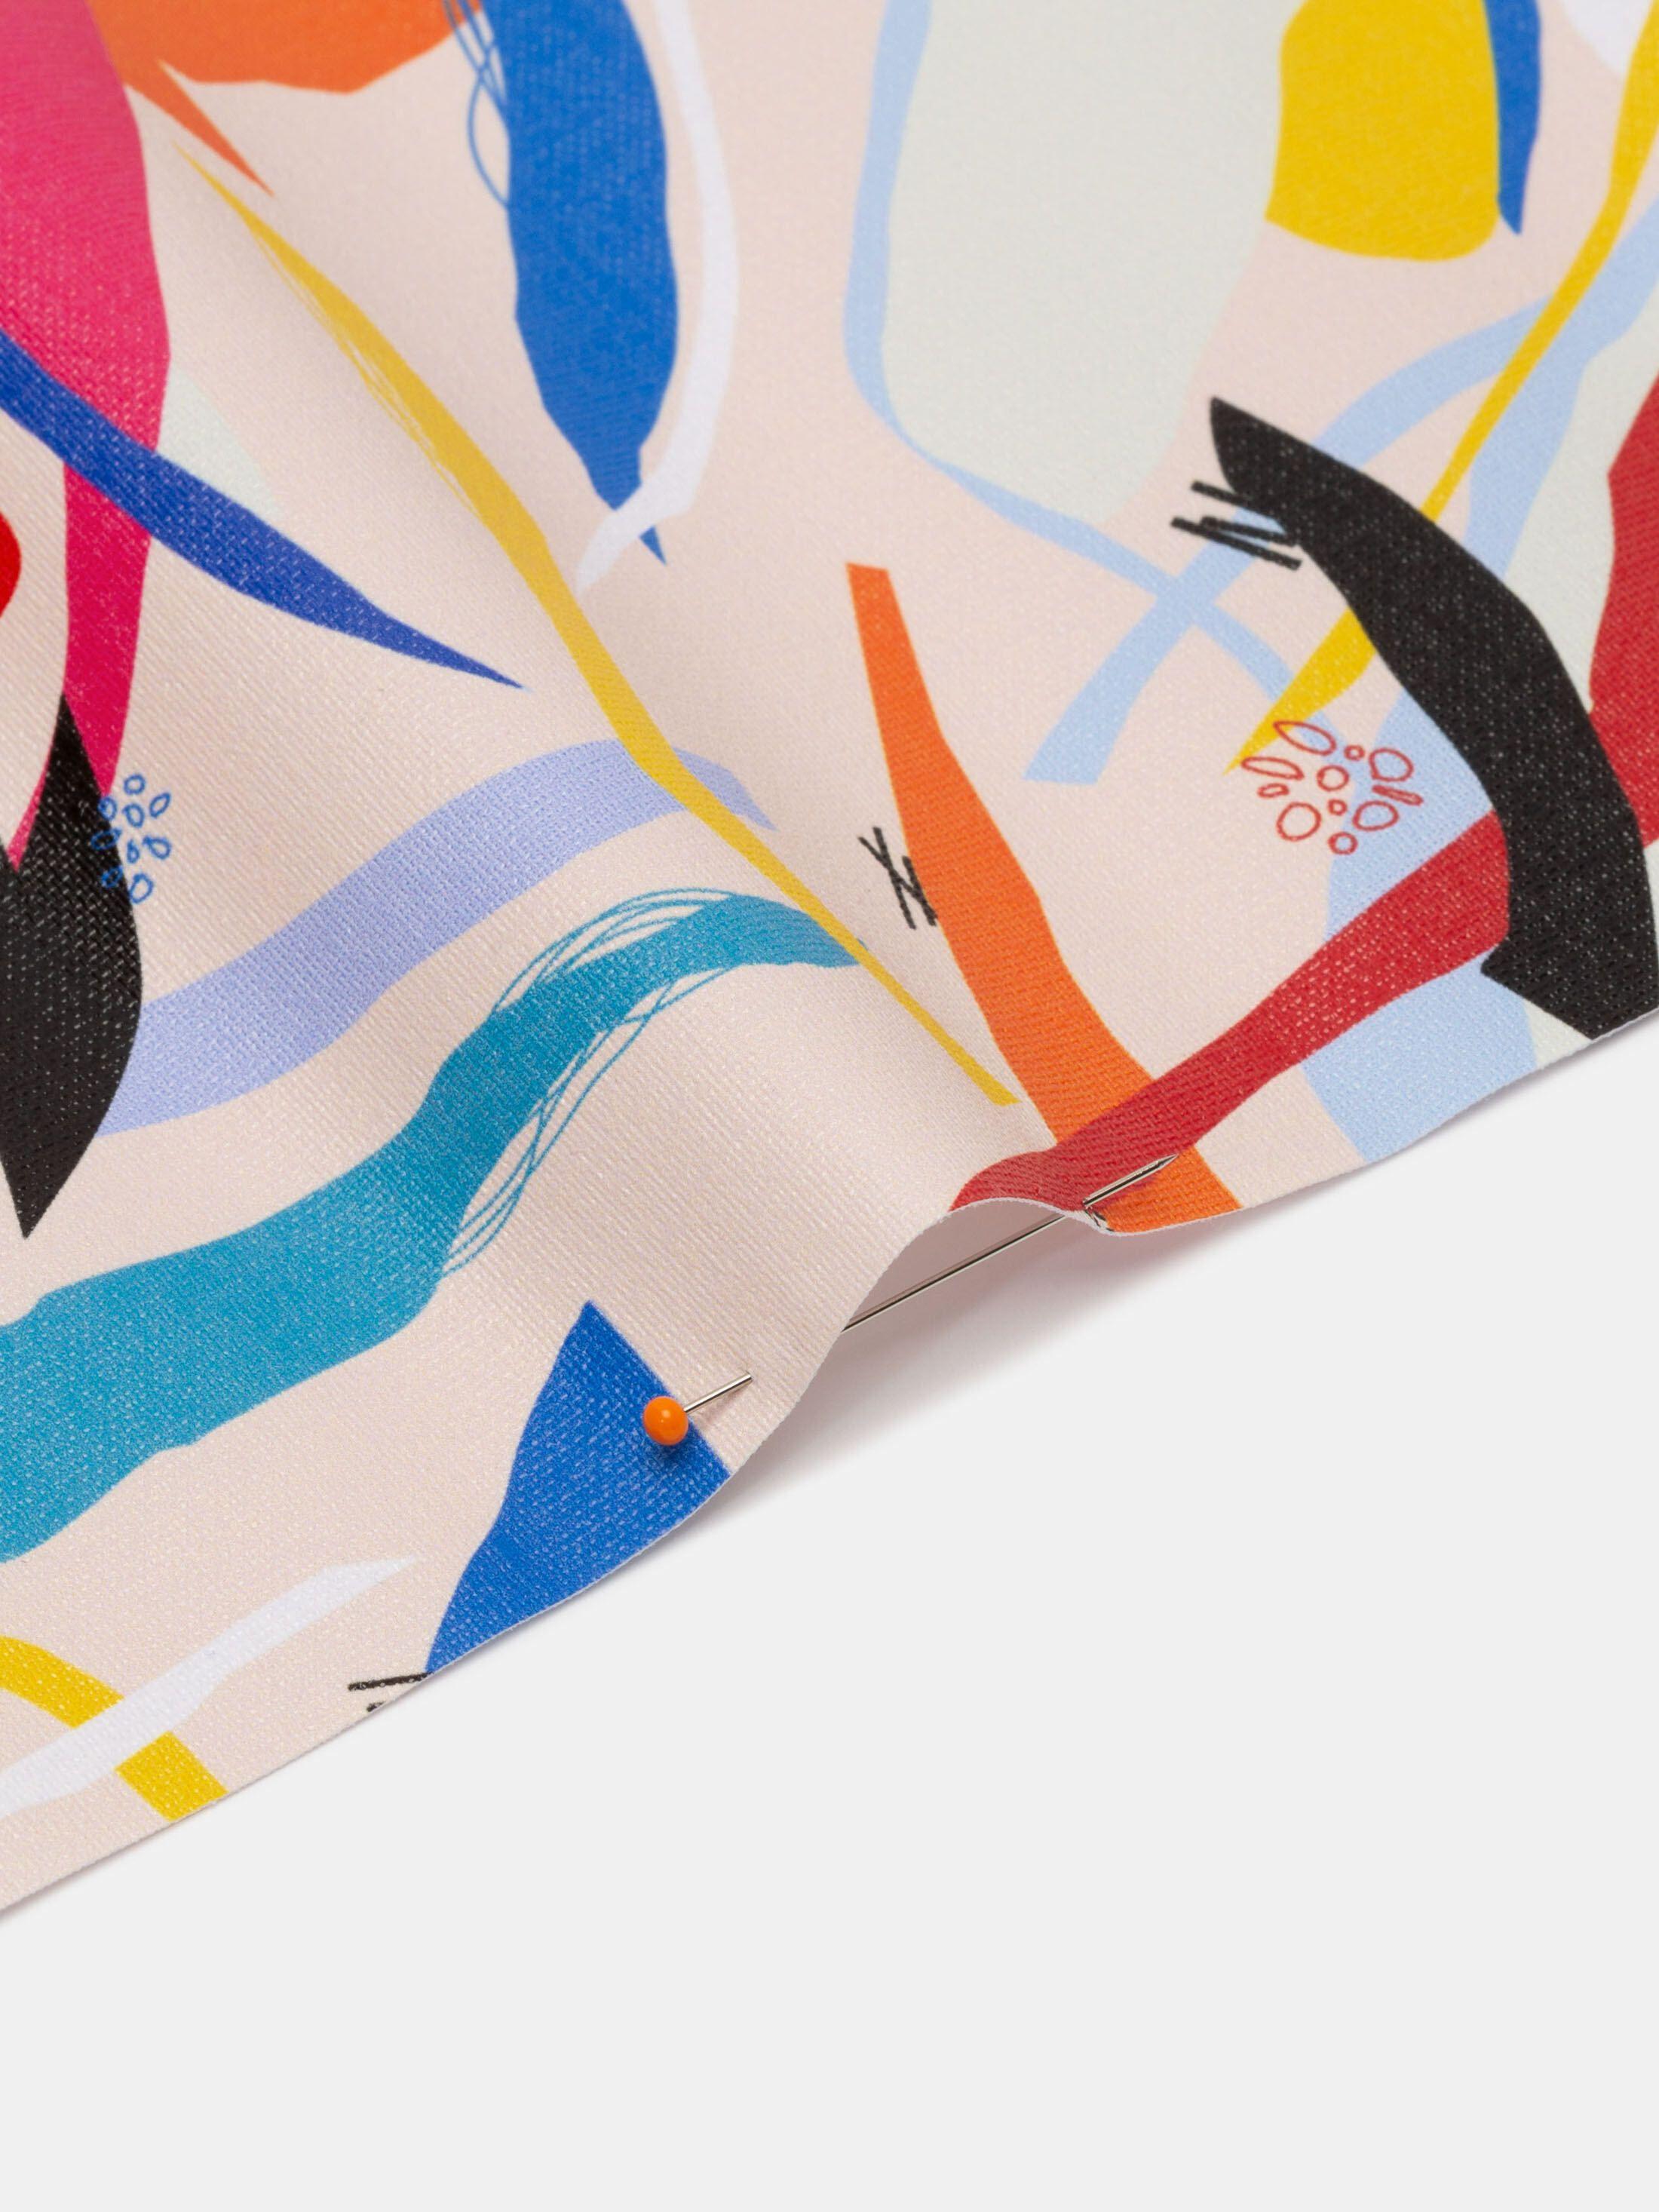 Custom made stiff translucent fabric